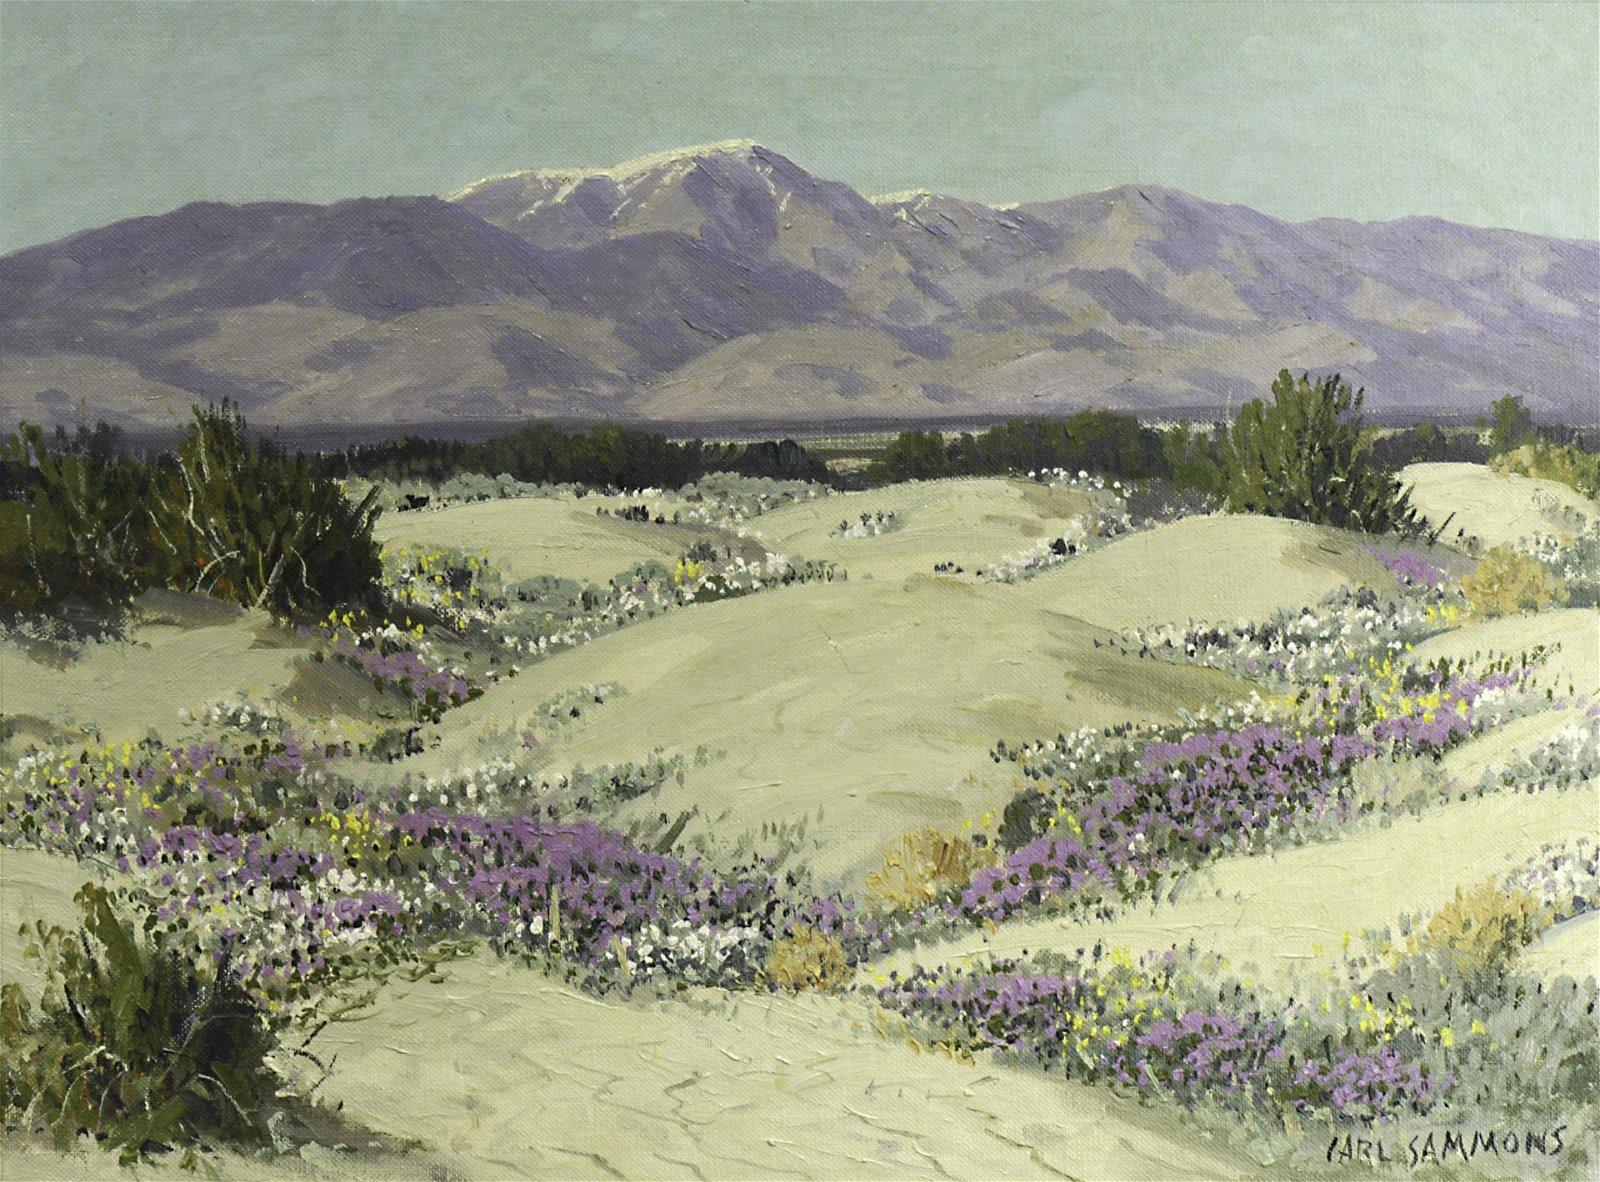 Painting, Carl Sammons